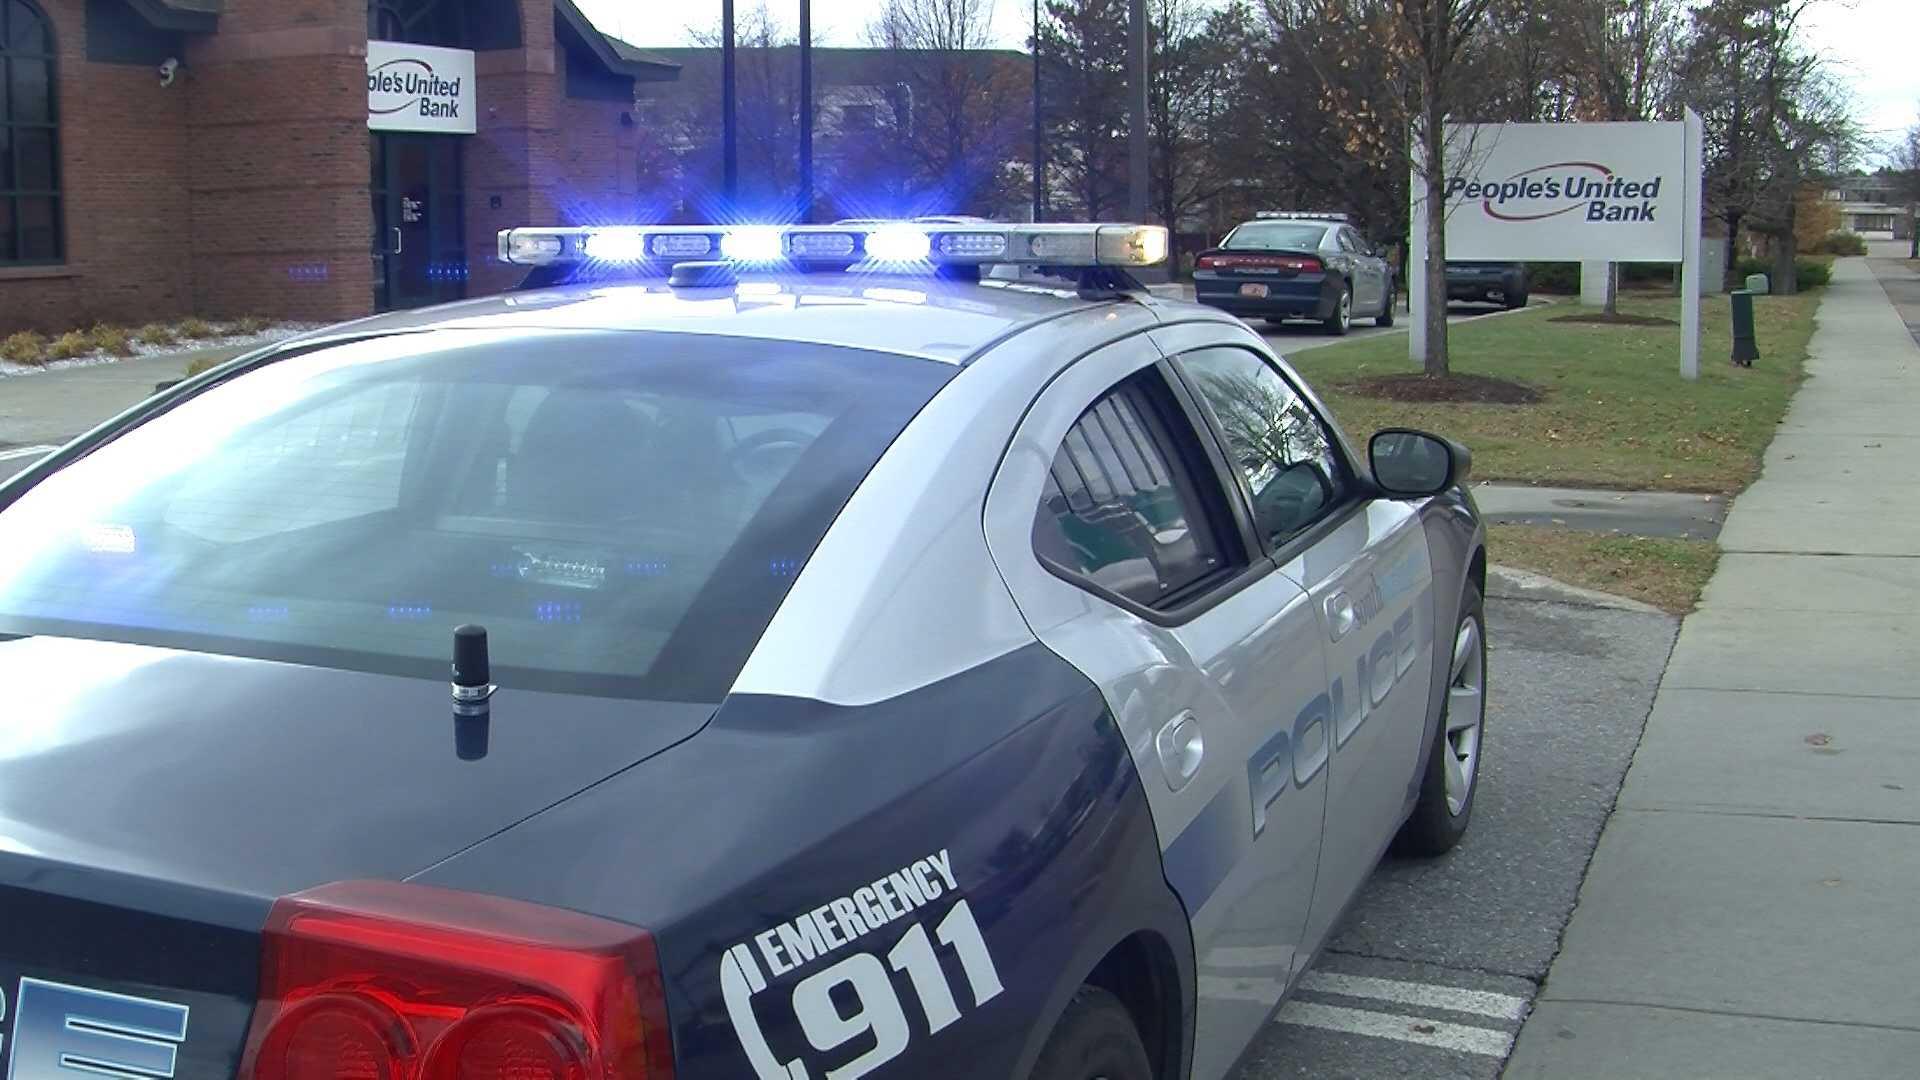 11-7 Bank robbed, suspect in custody - img